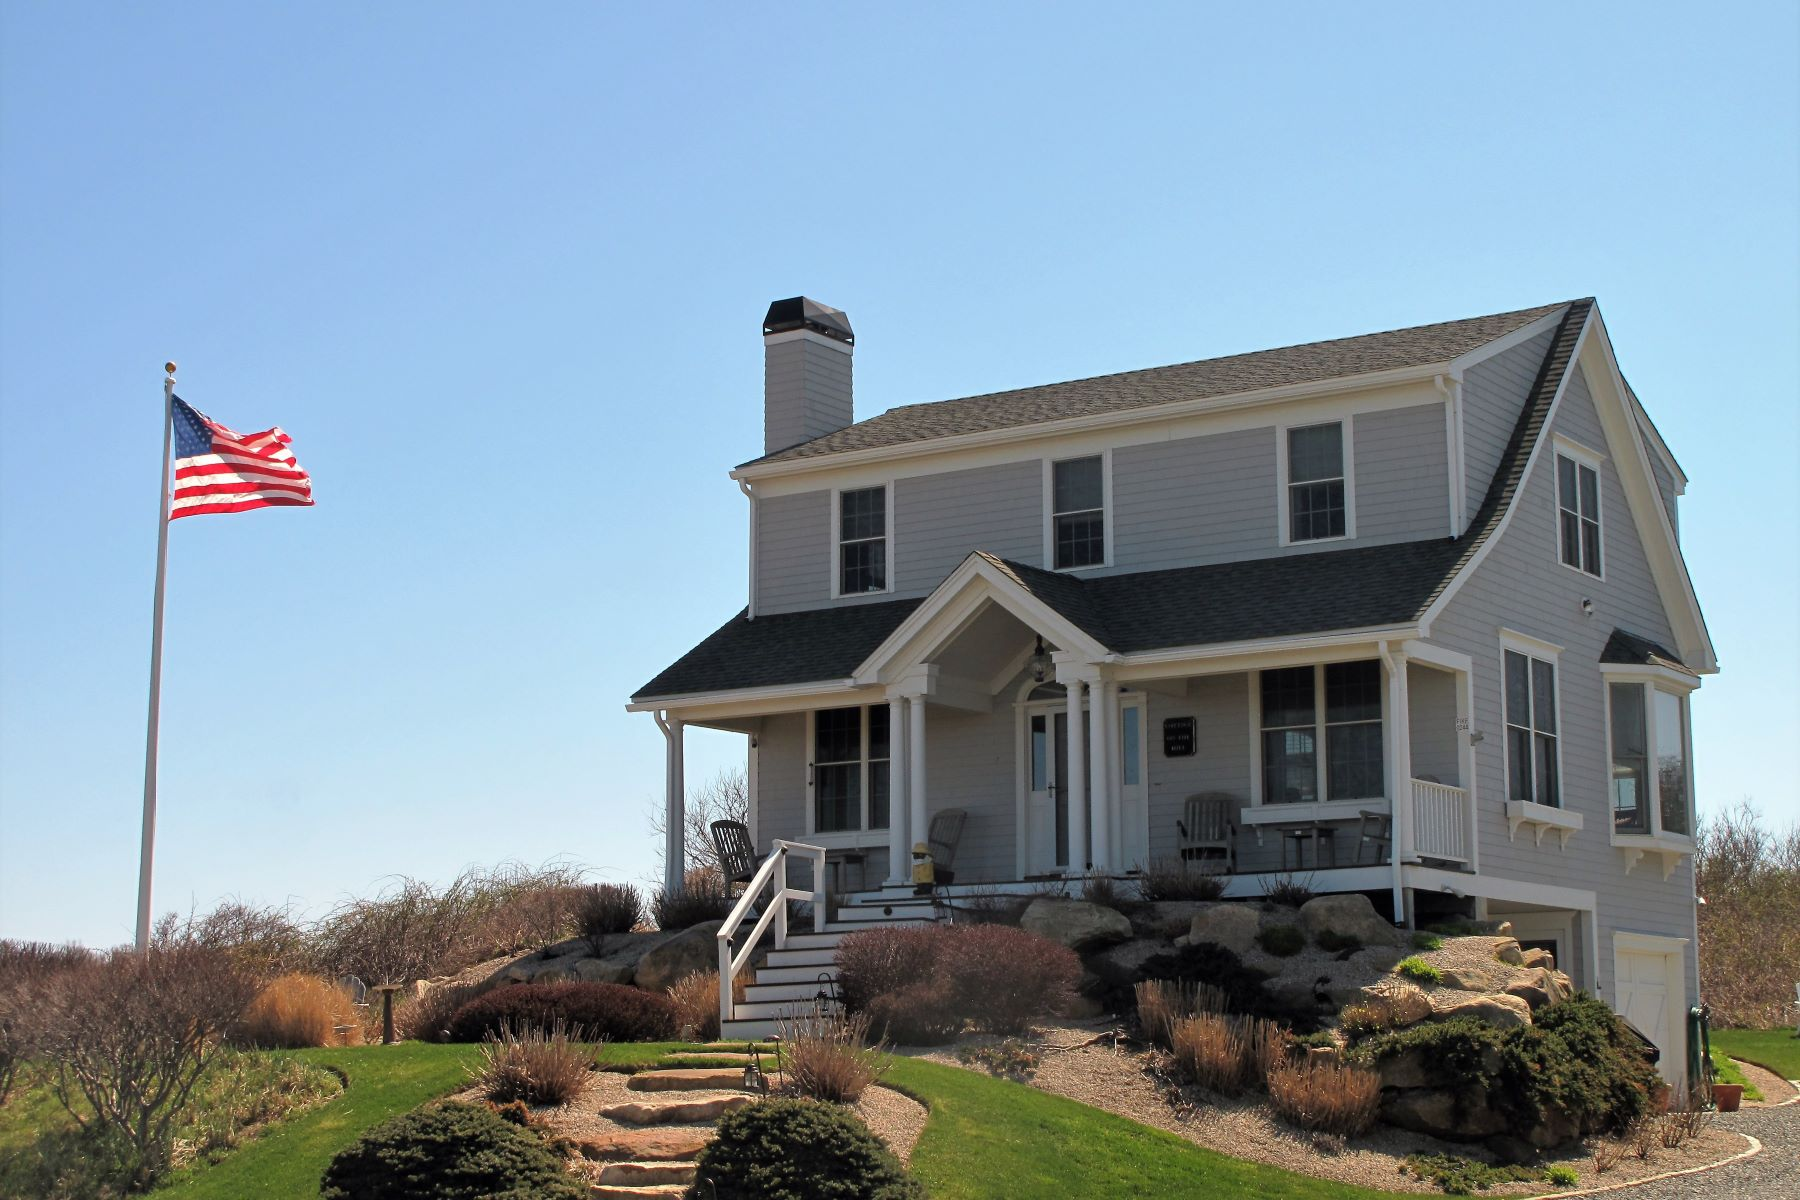 Single Family Home for Sale at Wonderful Atlantic Ocean Views 244 Spring Street, Block Island, Rhode Island, 02807 United States